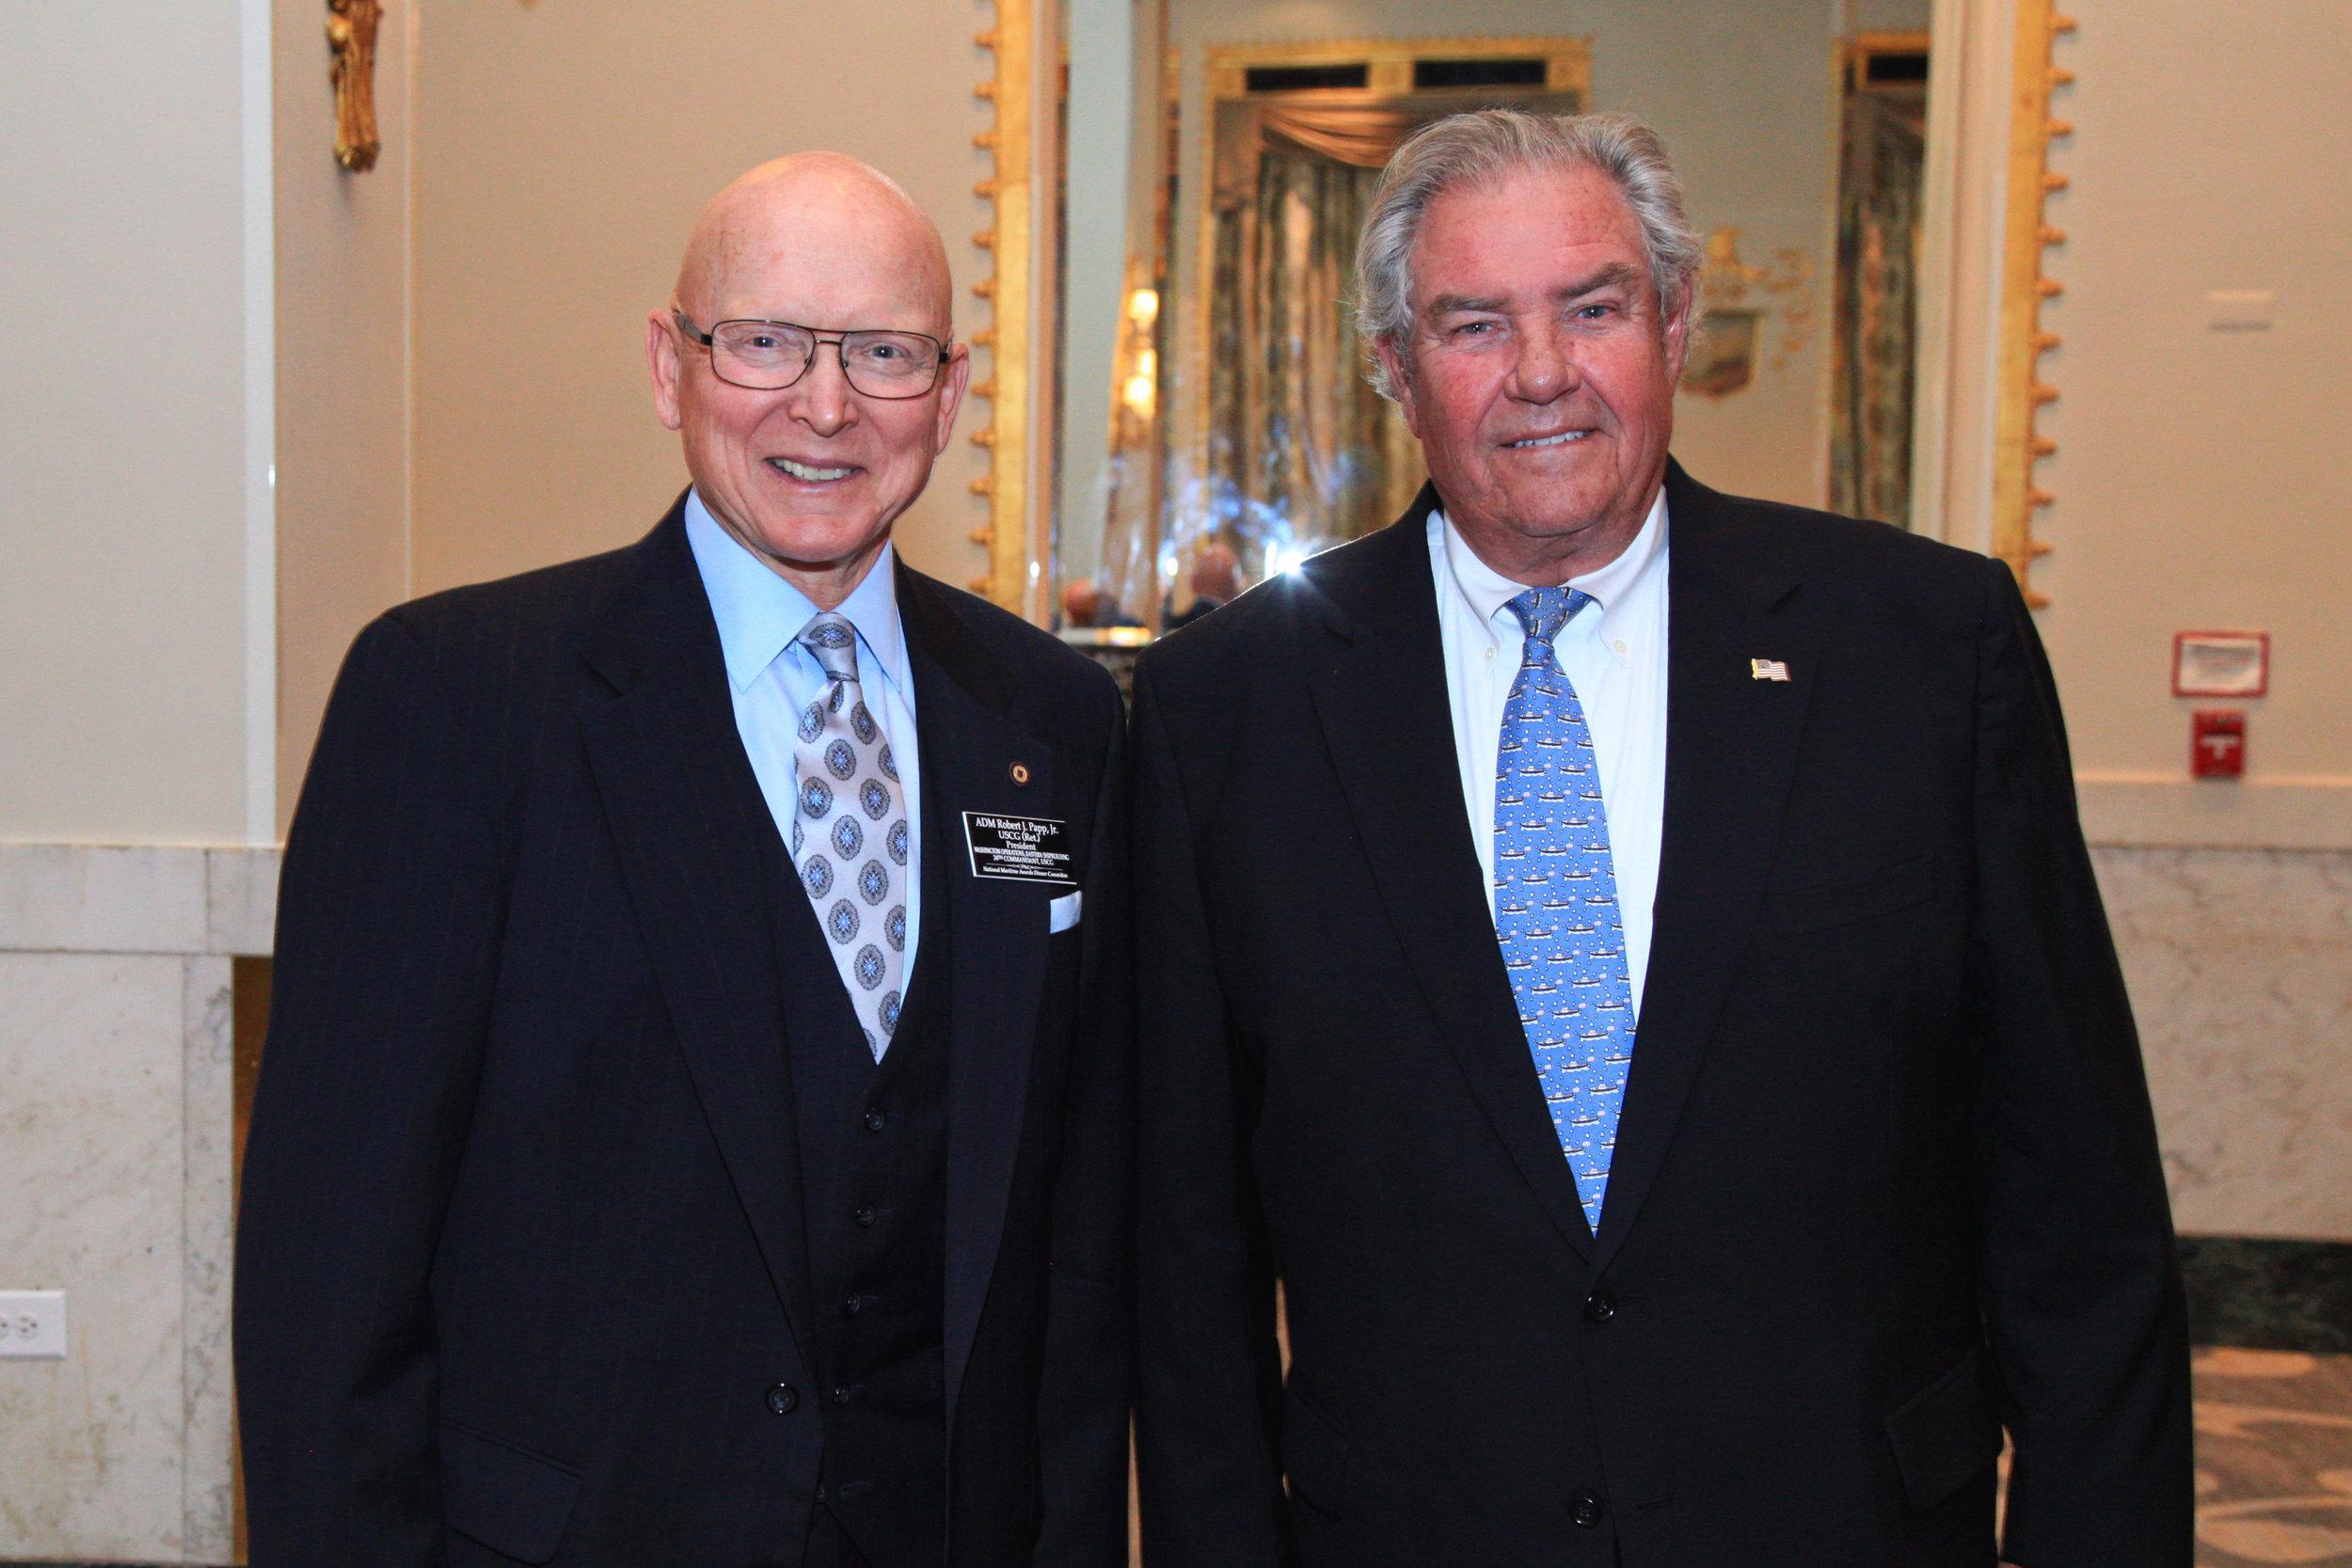 Admiral Robert J. Papp, Jr. USCG (Ret.) and Boysie Bollinger 4-25-18.jpg